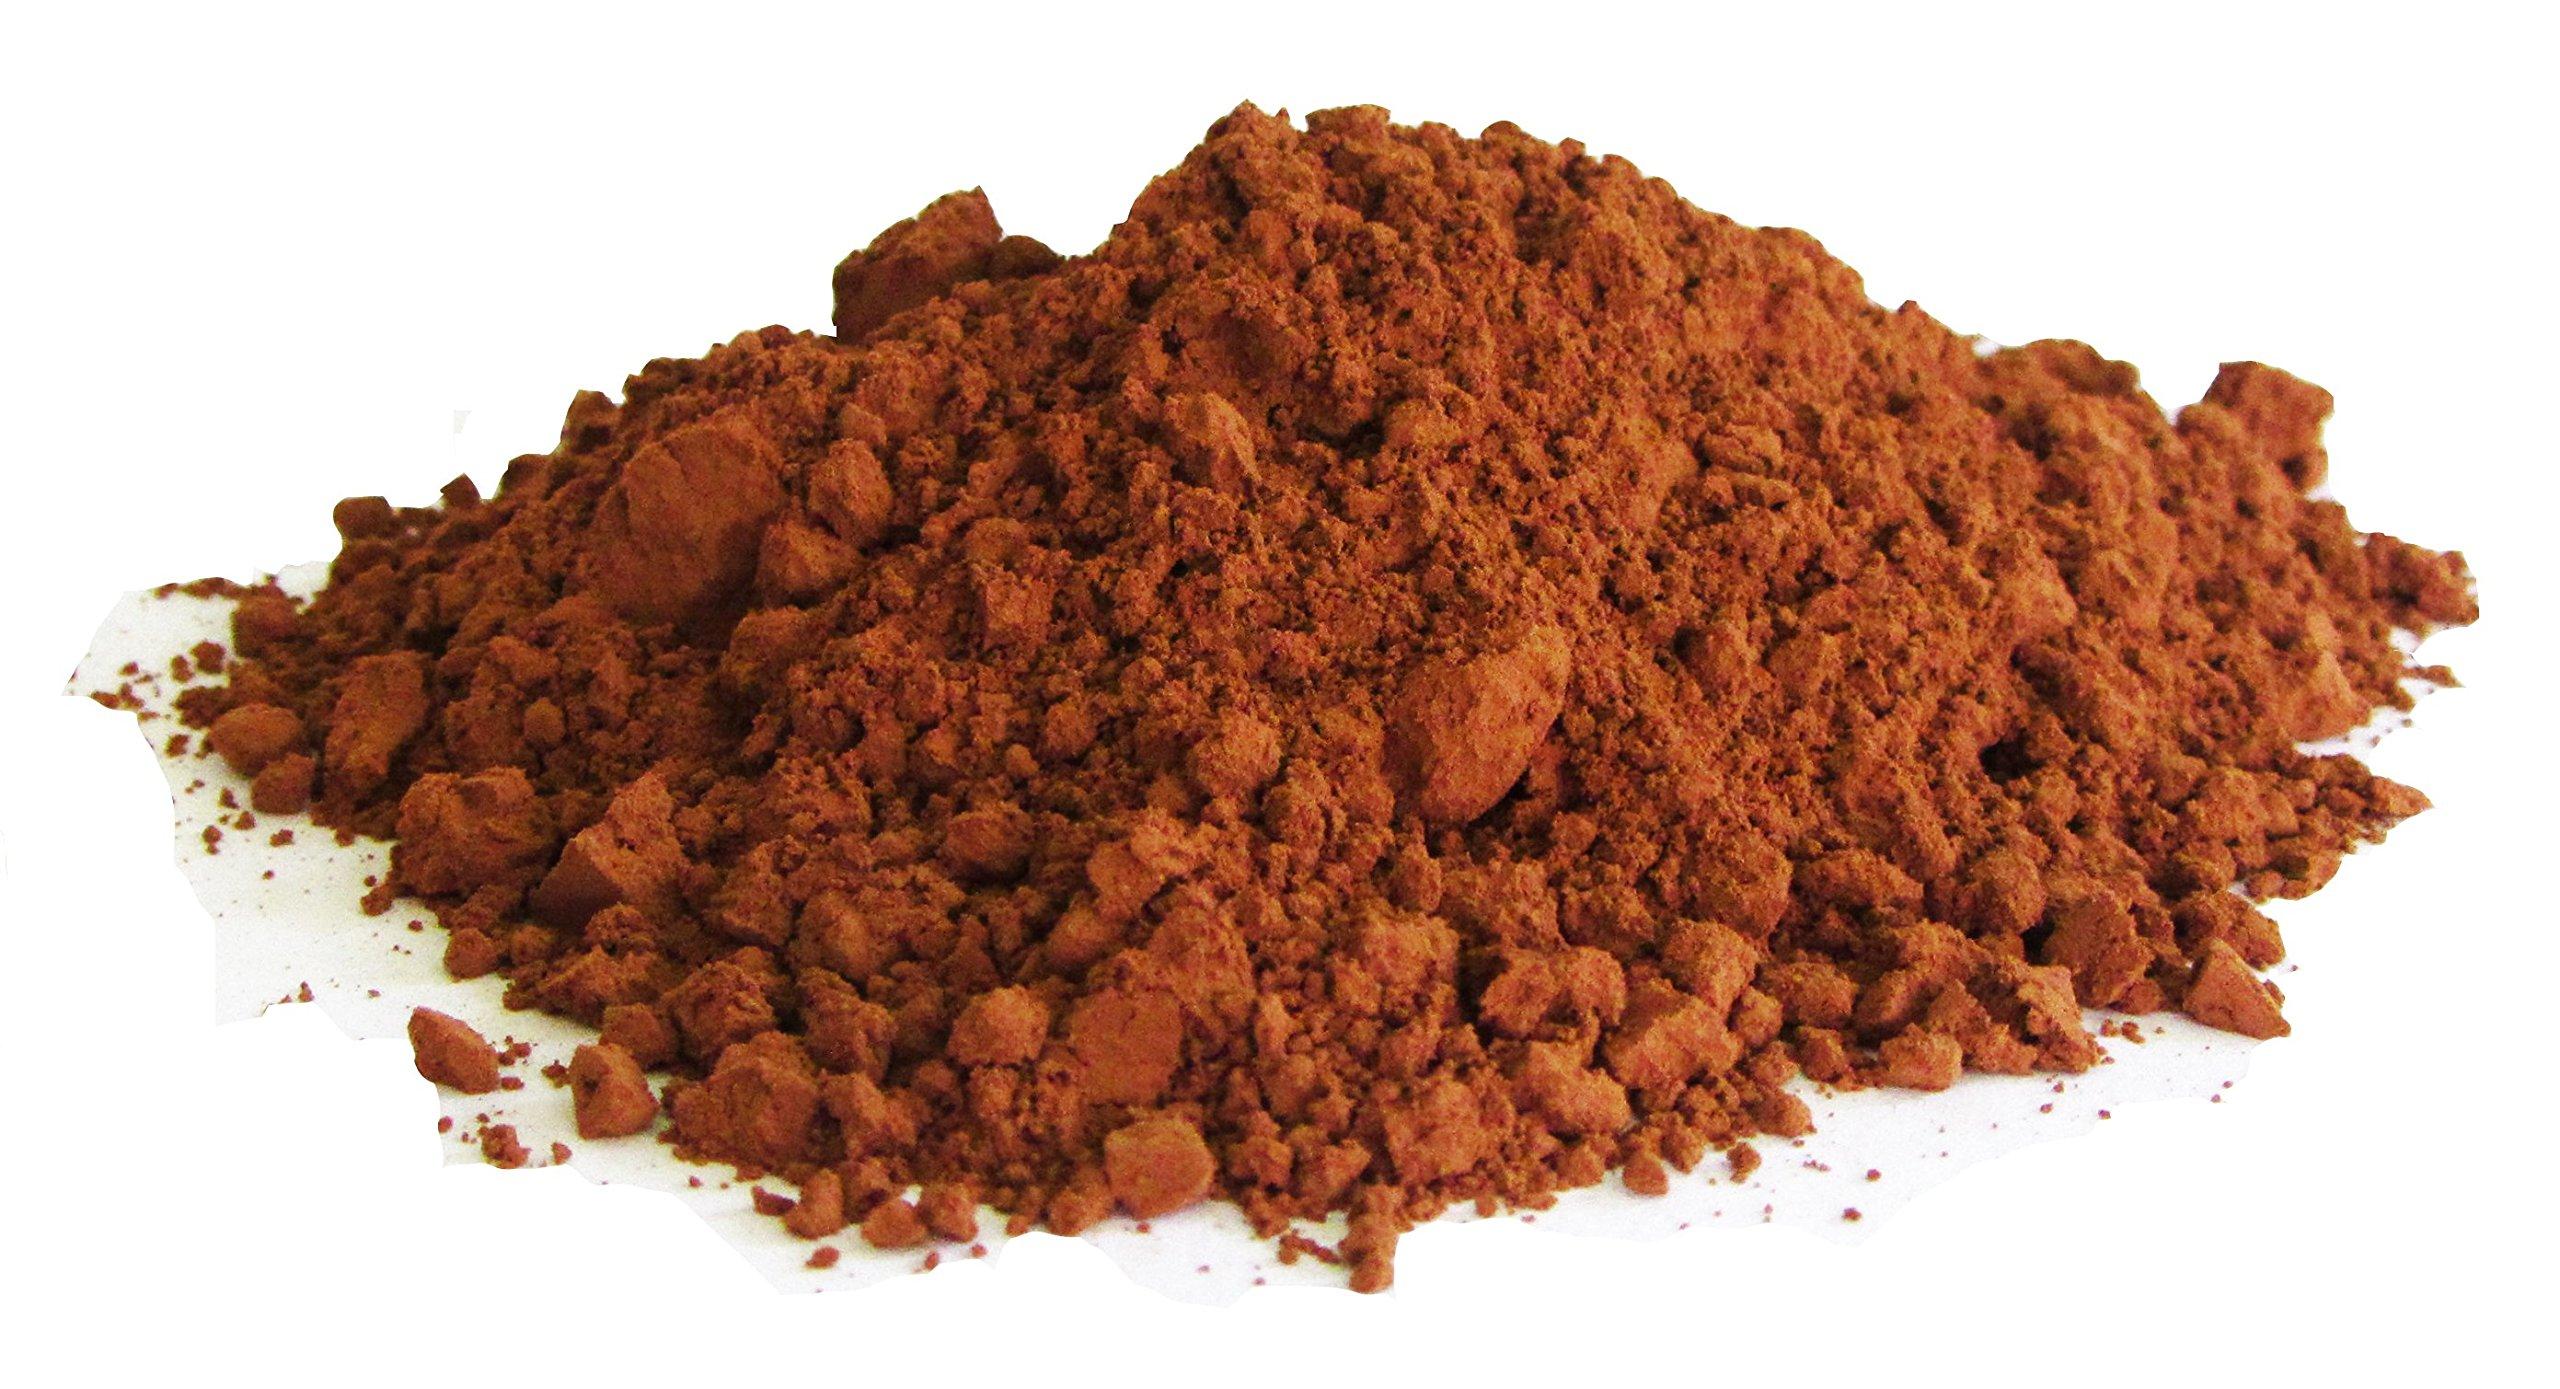 Natierra TerrAmazon Organic Cacao Powder   Gluten Free & Vegan   25 Pound